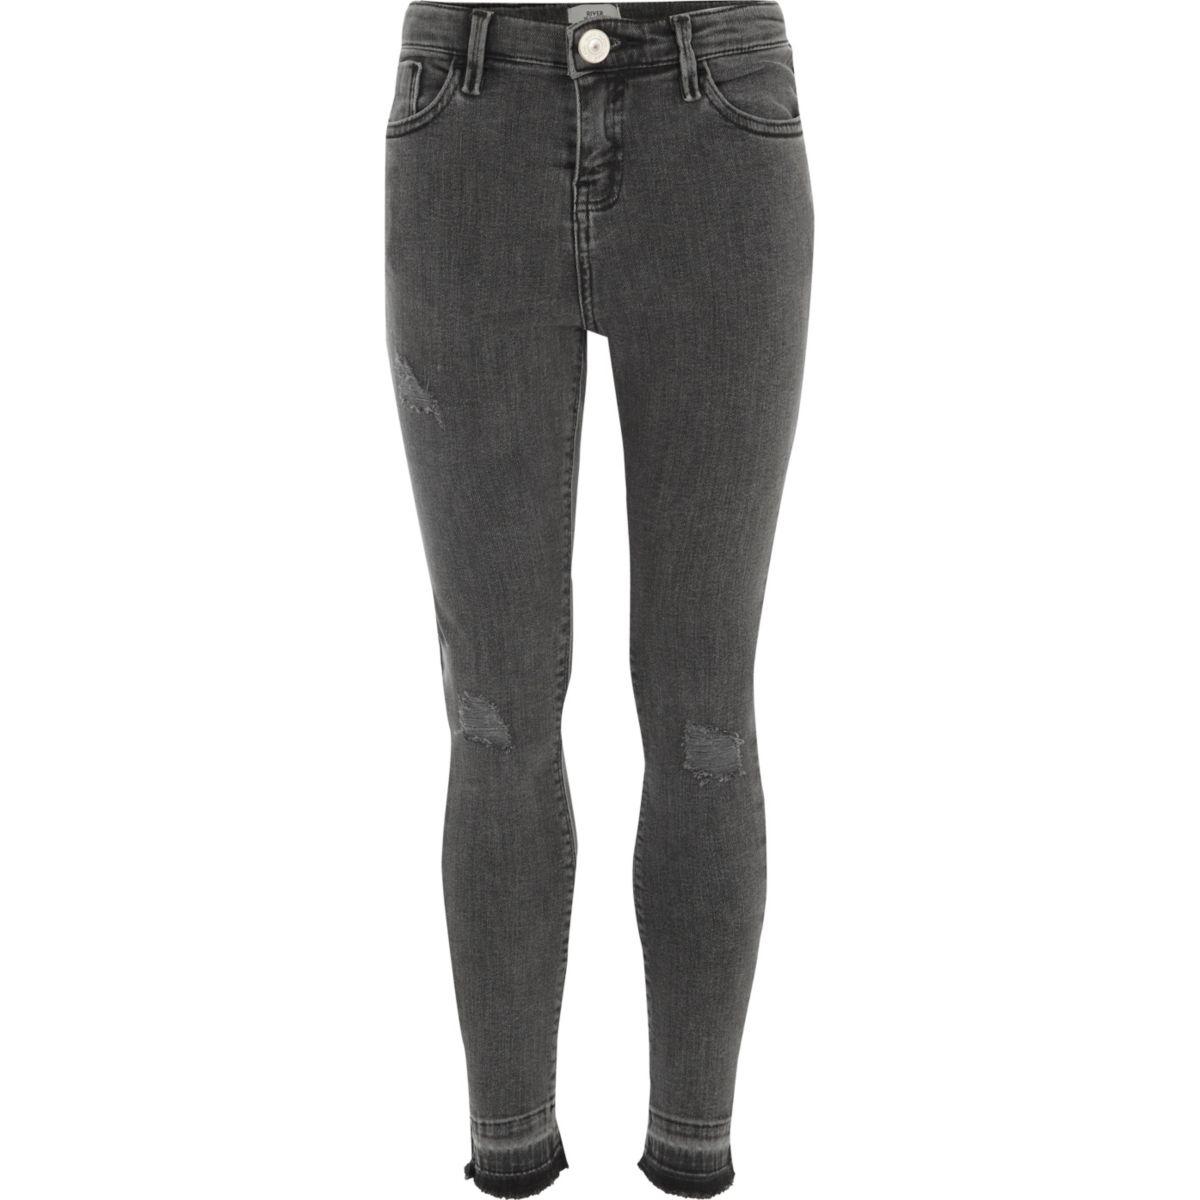 Girls black released hem skinny fit jeans